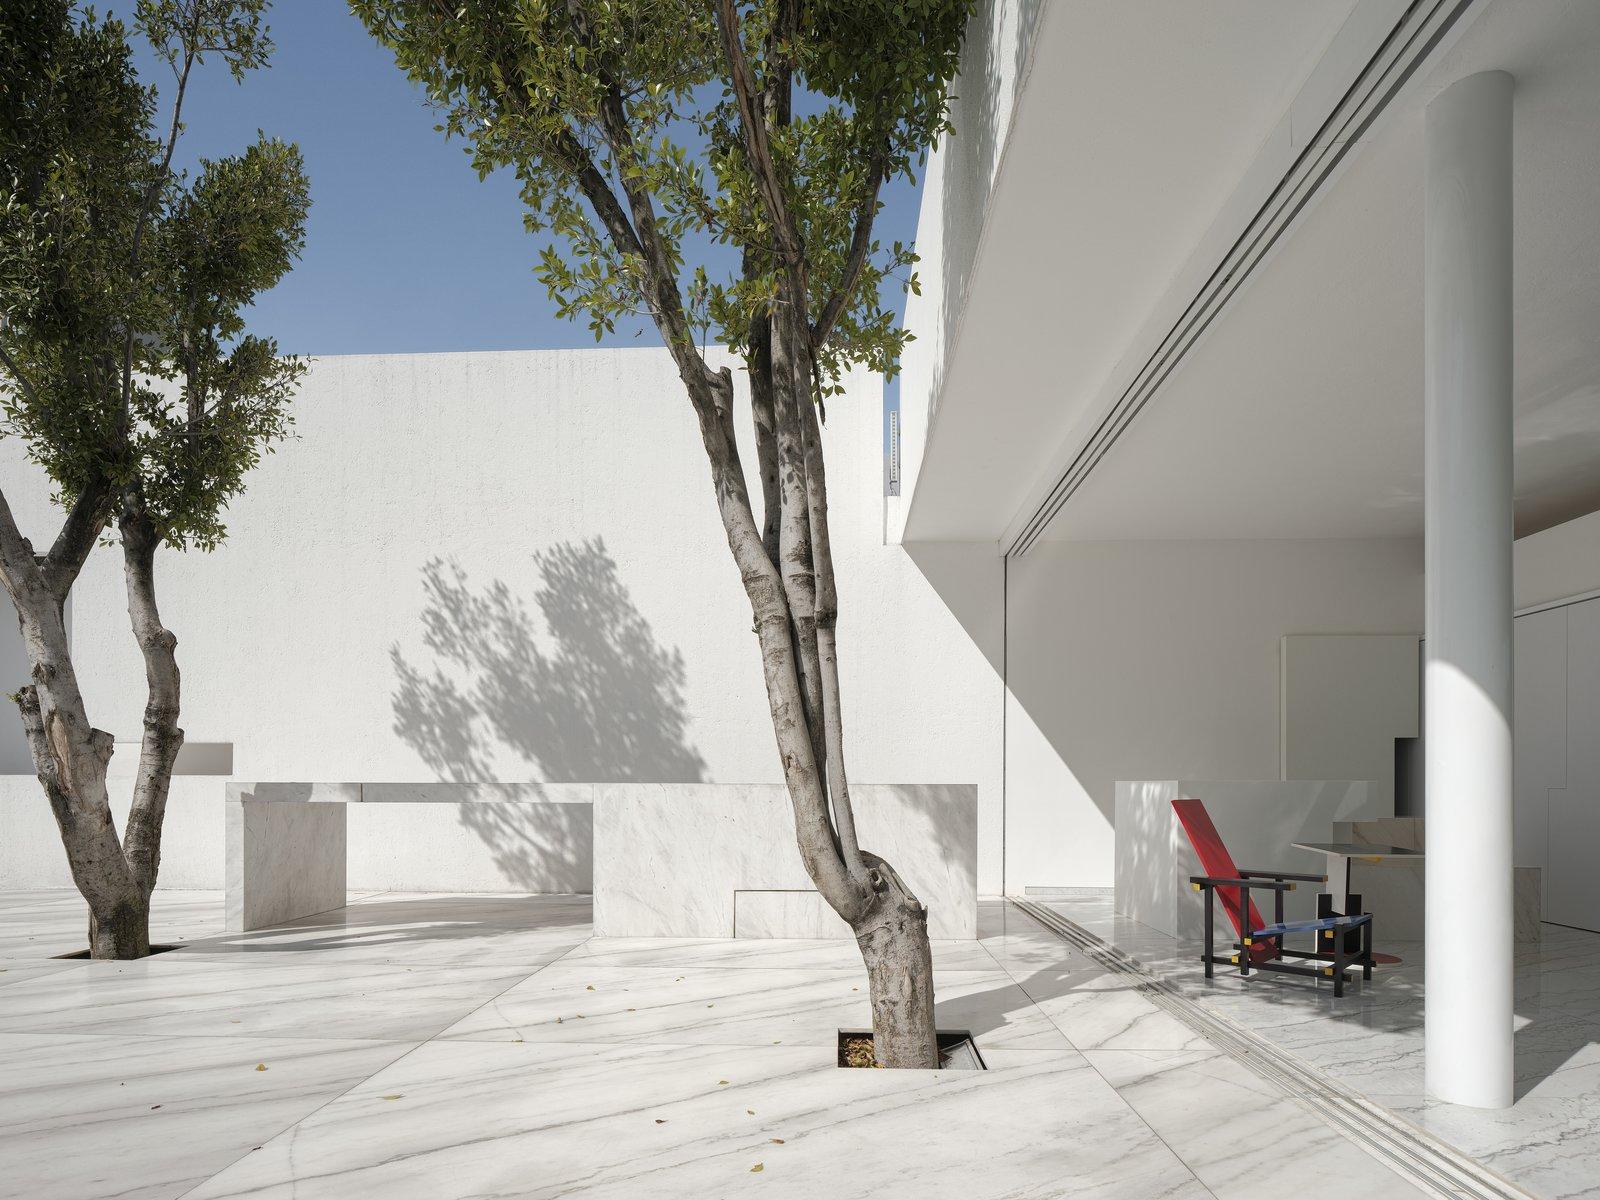 Miguel Angel Aragonés Rombo III marble exterior courtyard